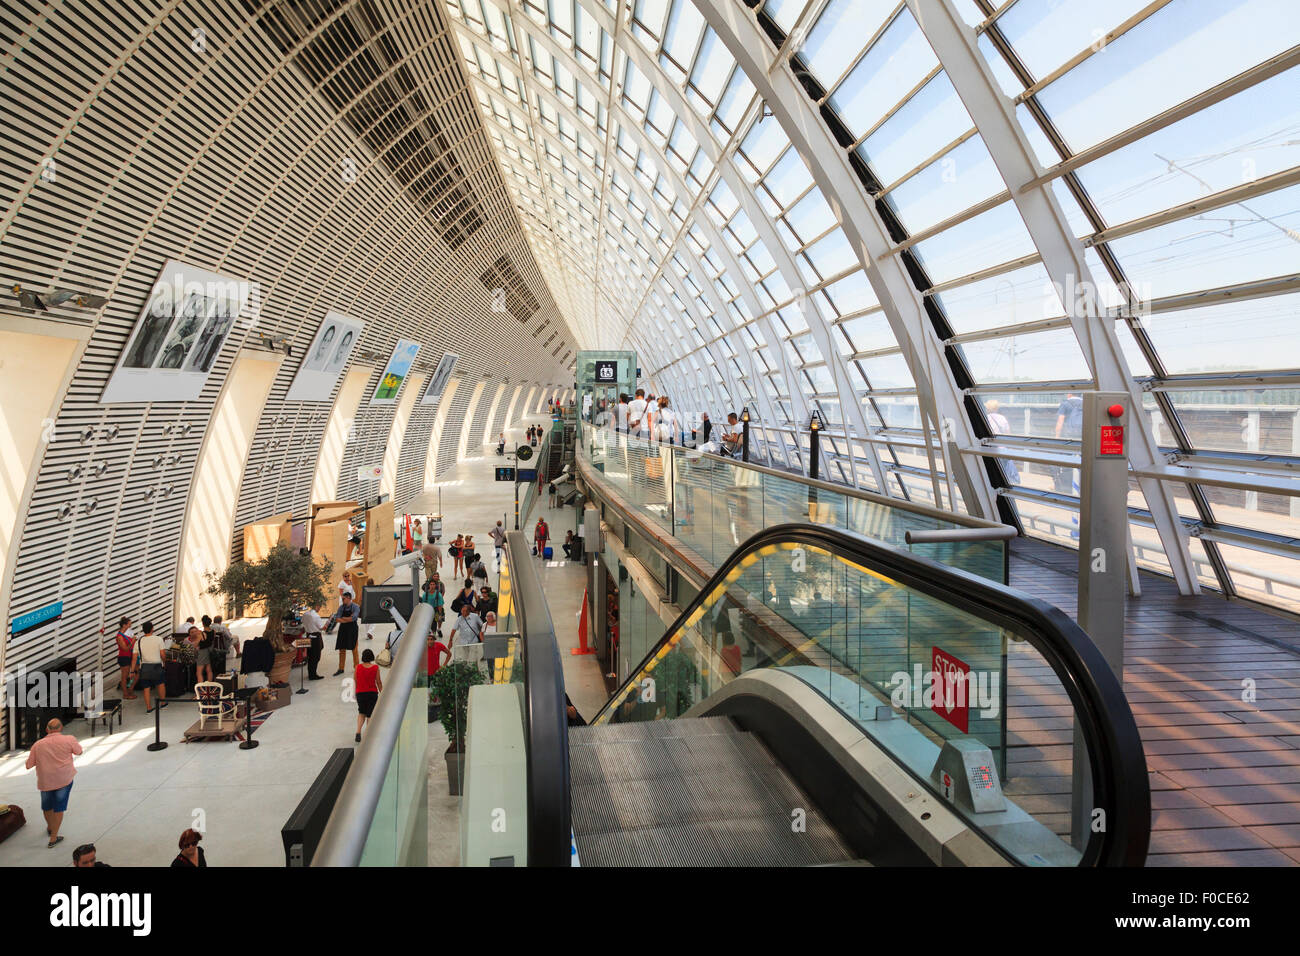 Escalator Inside the modern architectural Avignon TGV railway station - Stock Image